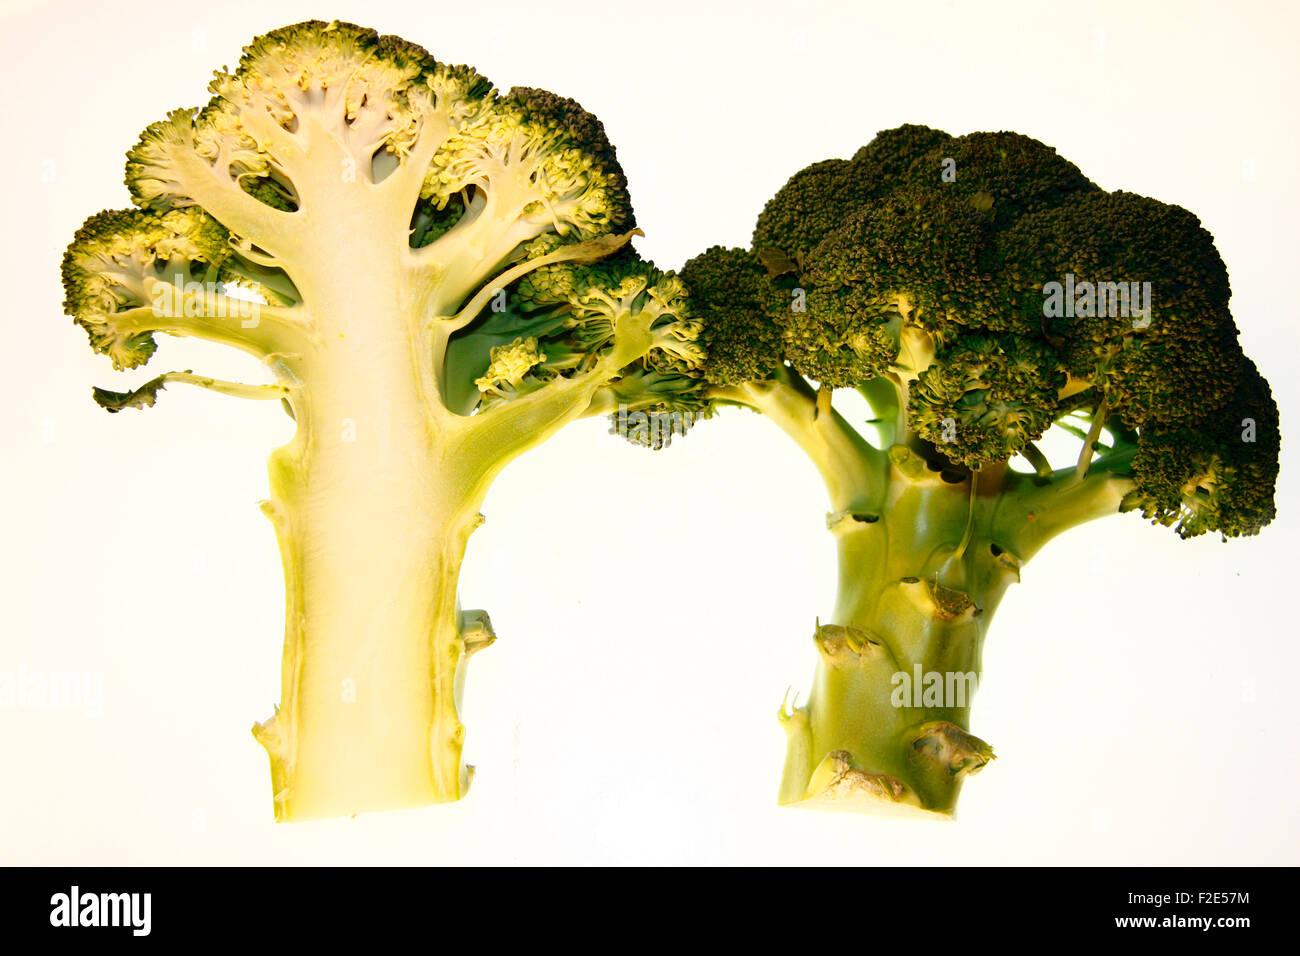 Brokkoli / broccoli - Symbolbild Nahrungsmittel. Stock Photo